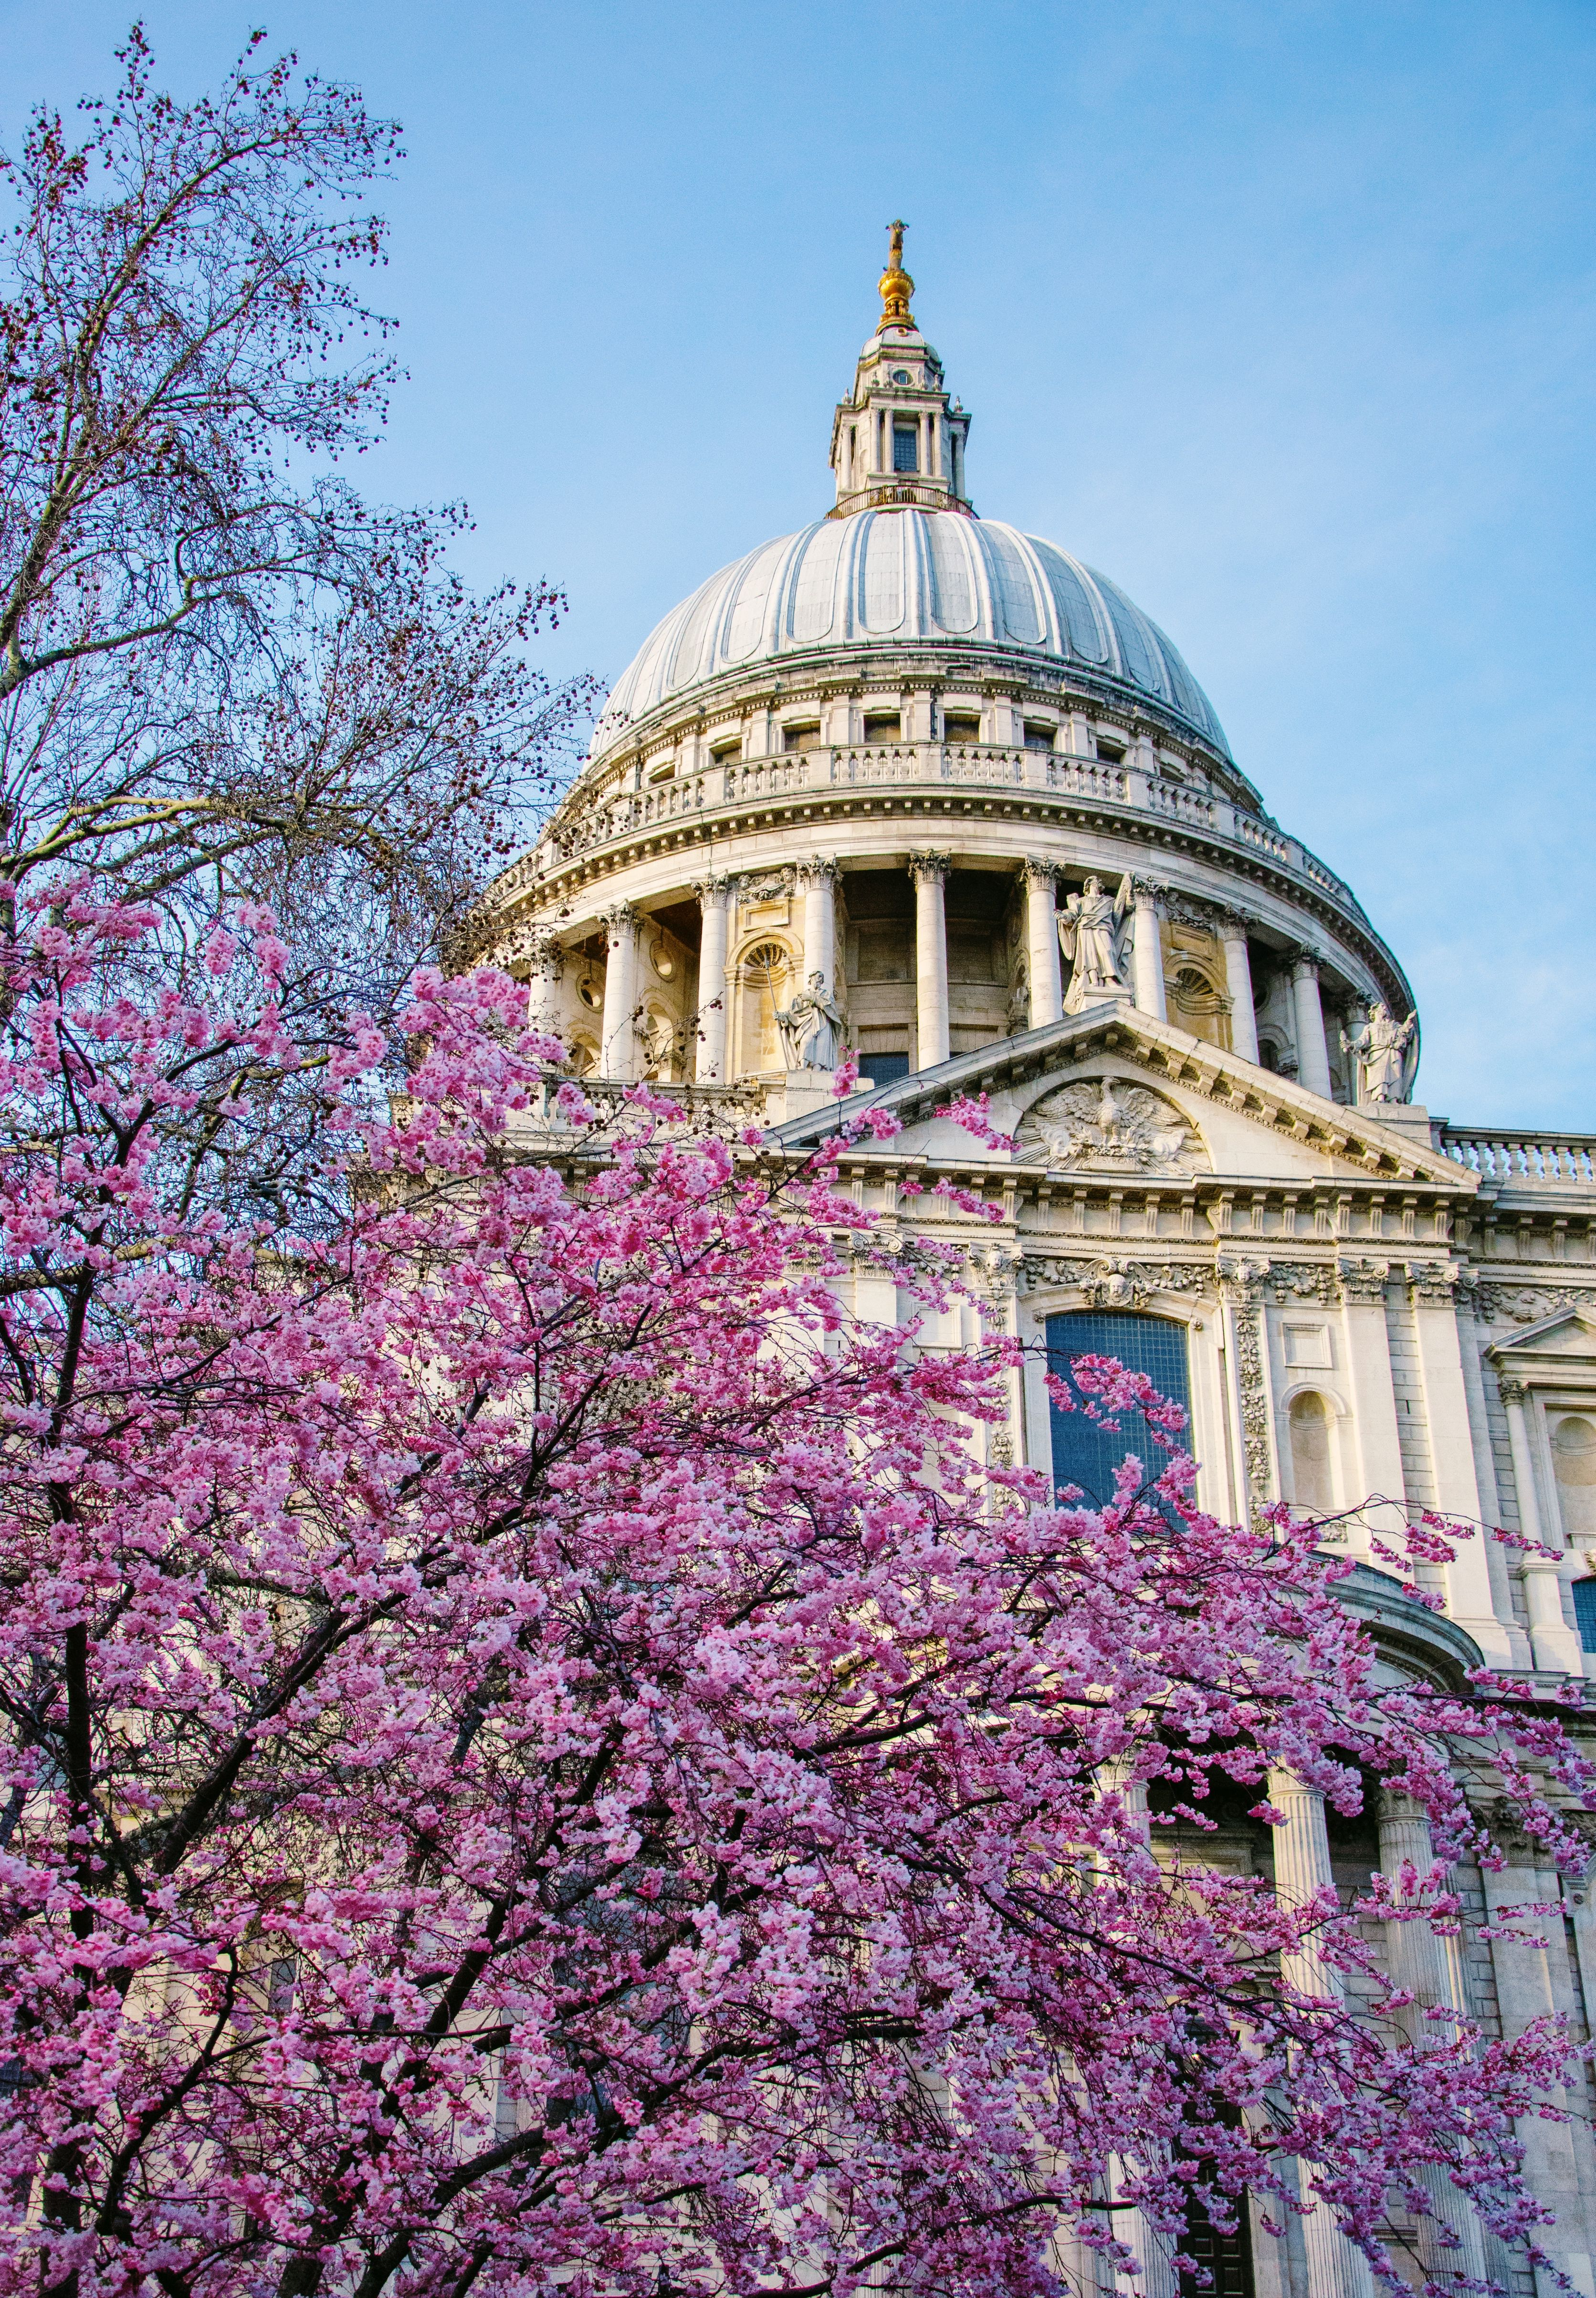 London Photography Regents Park Cherry Blossoms England Etsy London Photography London Photos Travel Photos